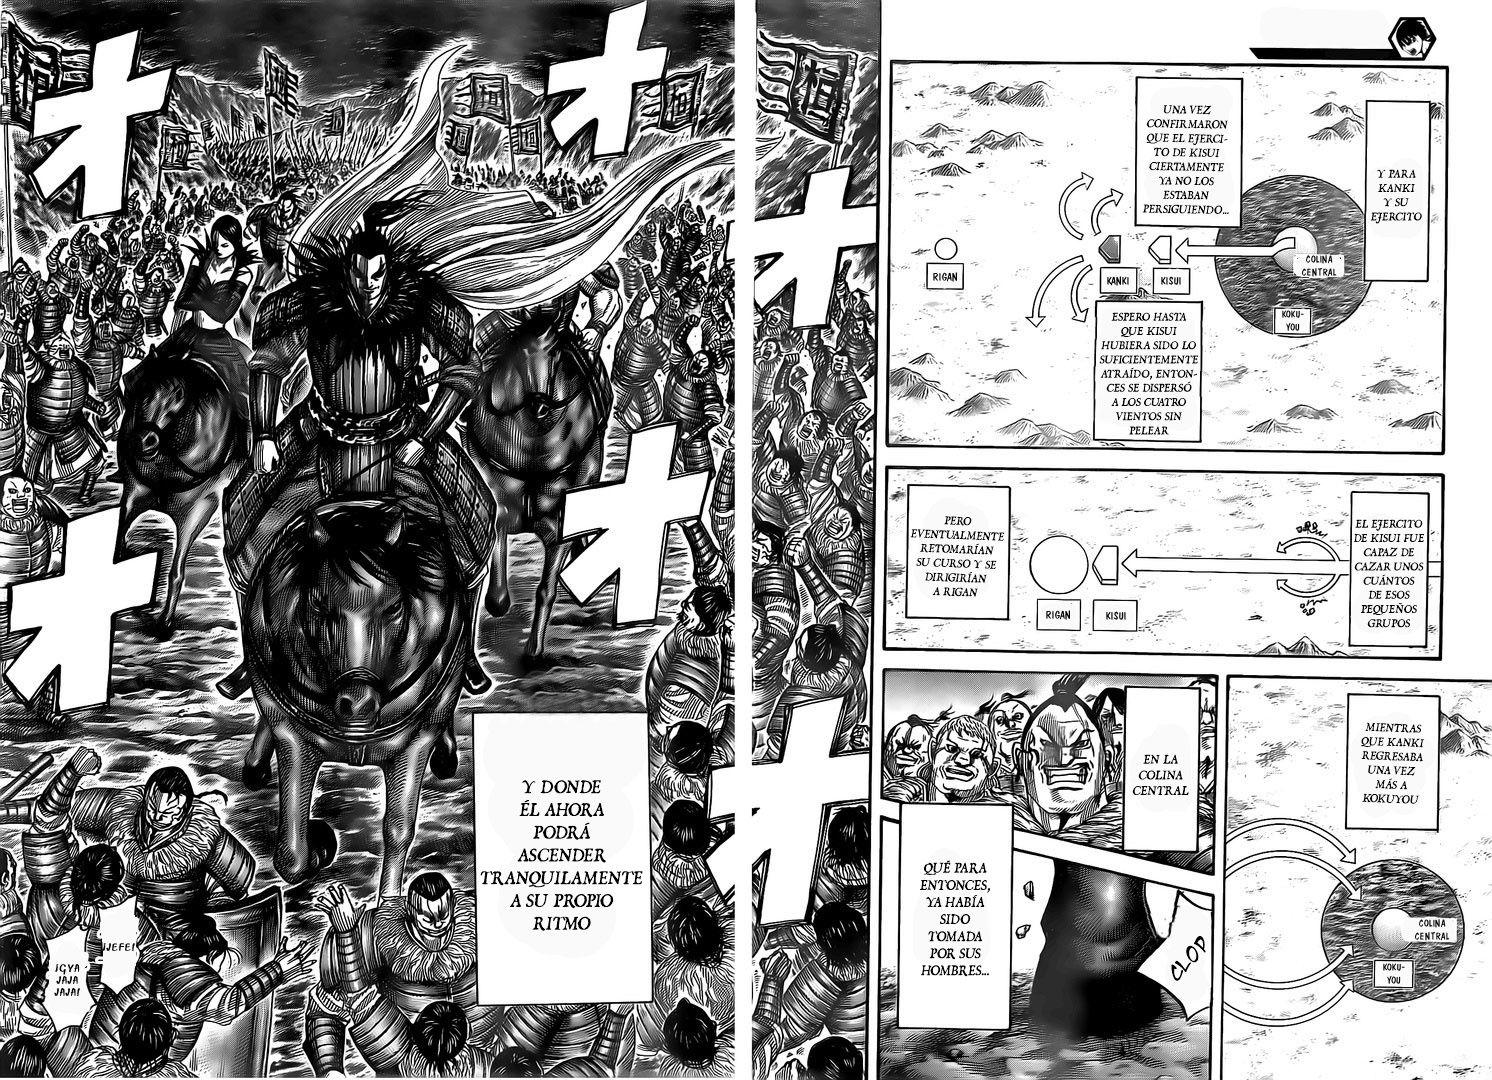 http://c5.ninemanga.com/es_manga/19/12307/486014/22cb6d3bb1829c7743808d2656462dc7.jpg Page 10